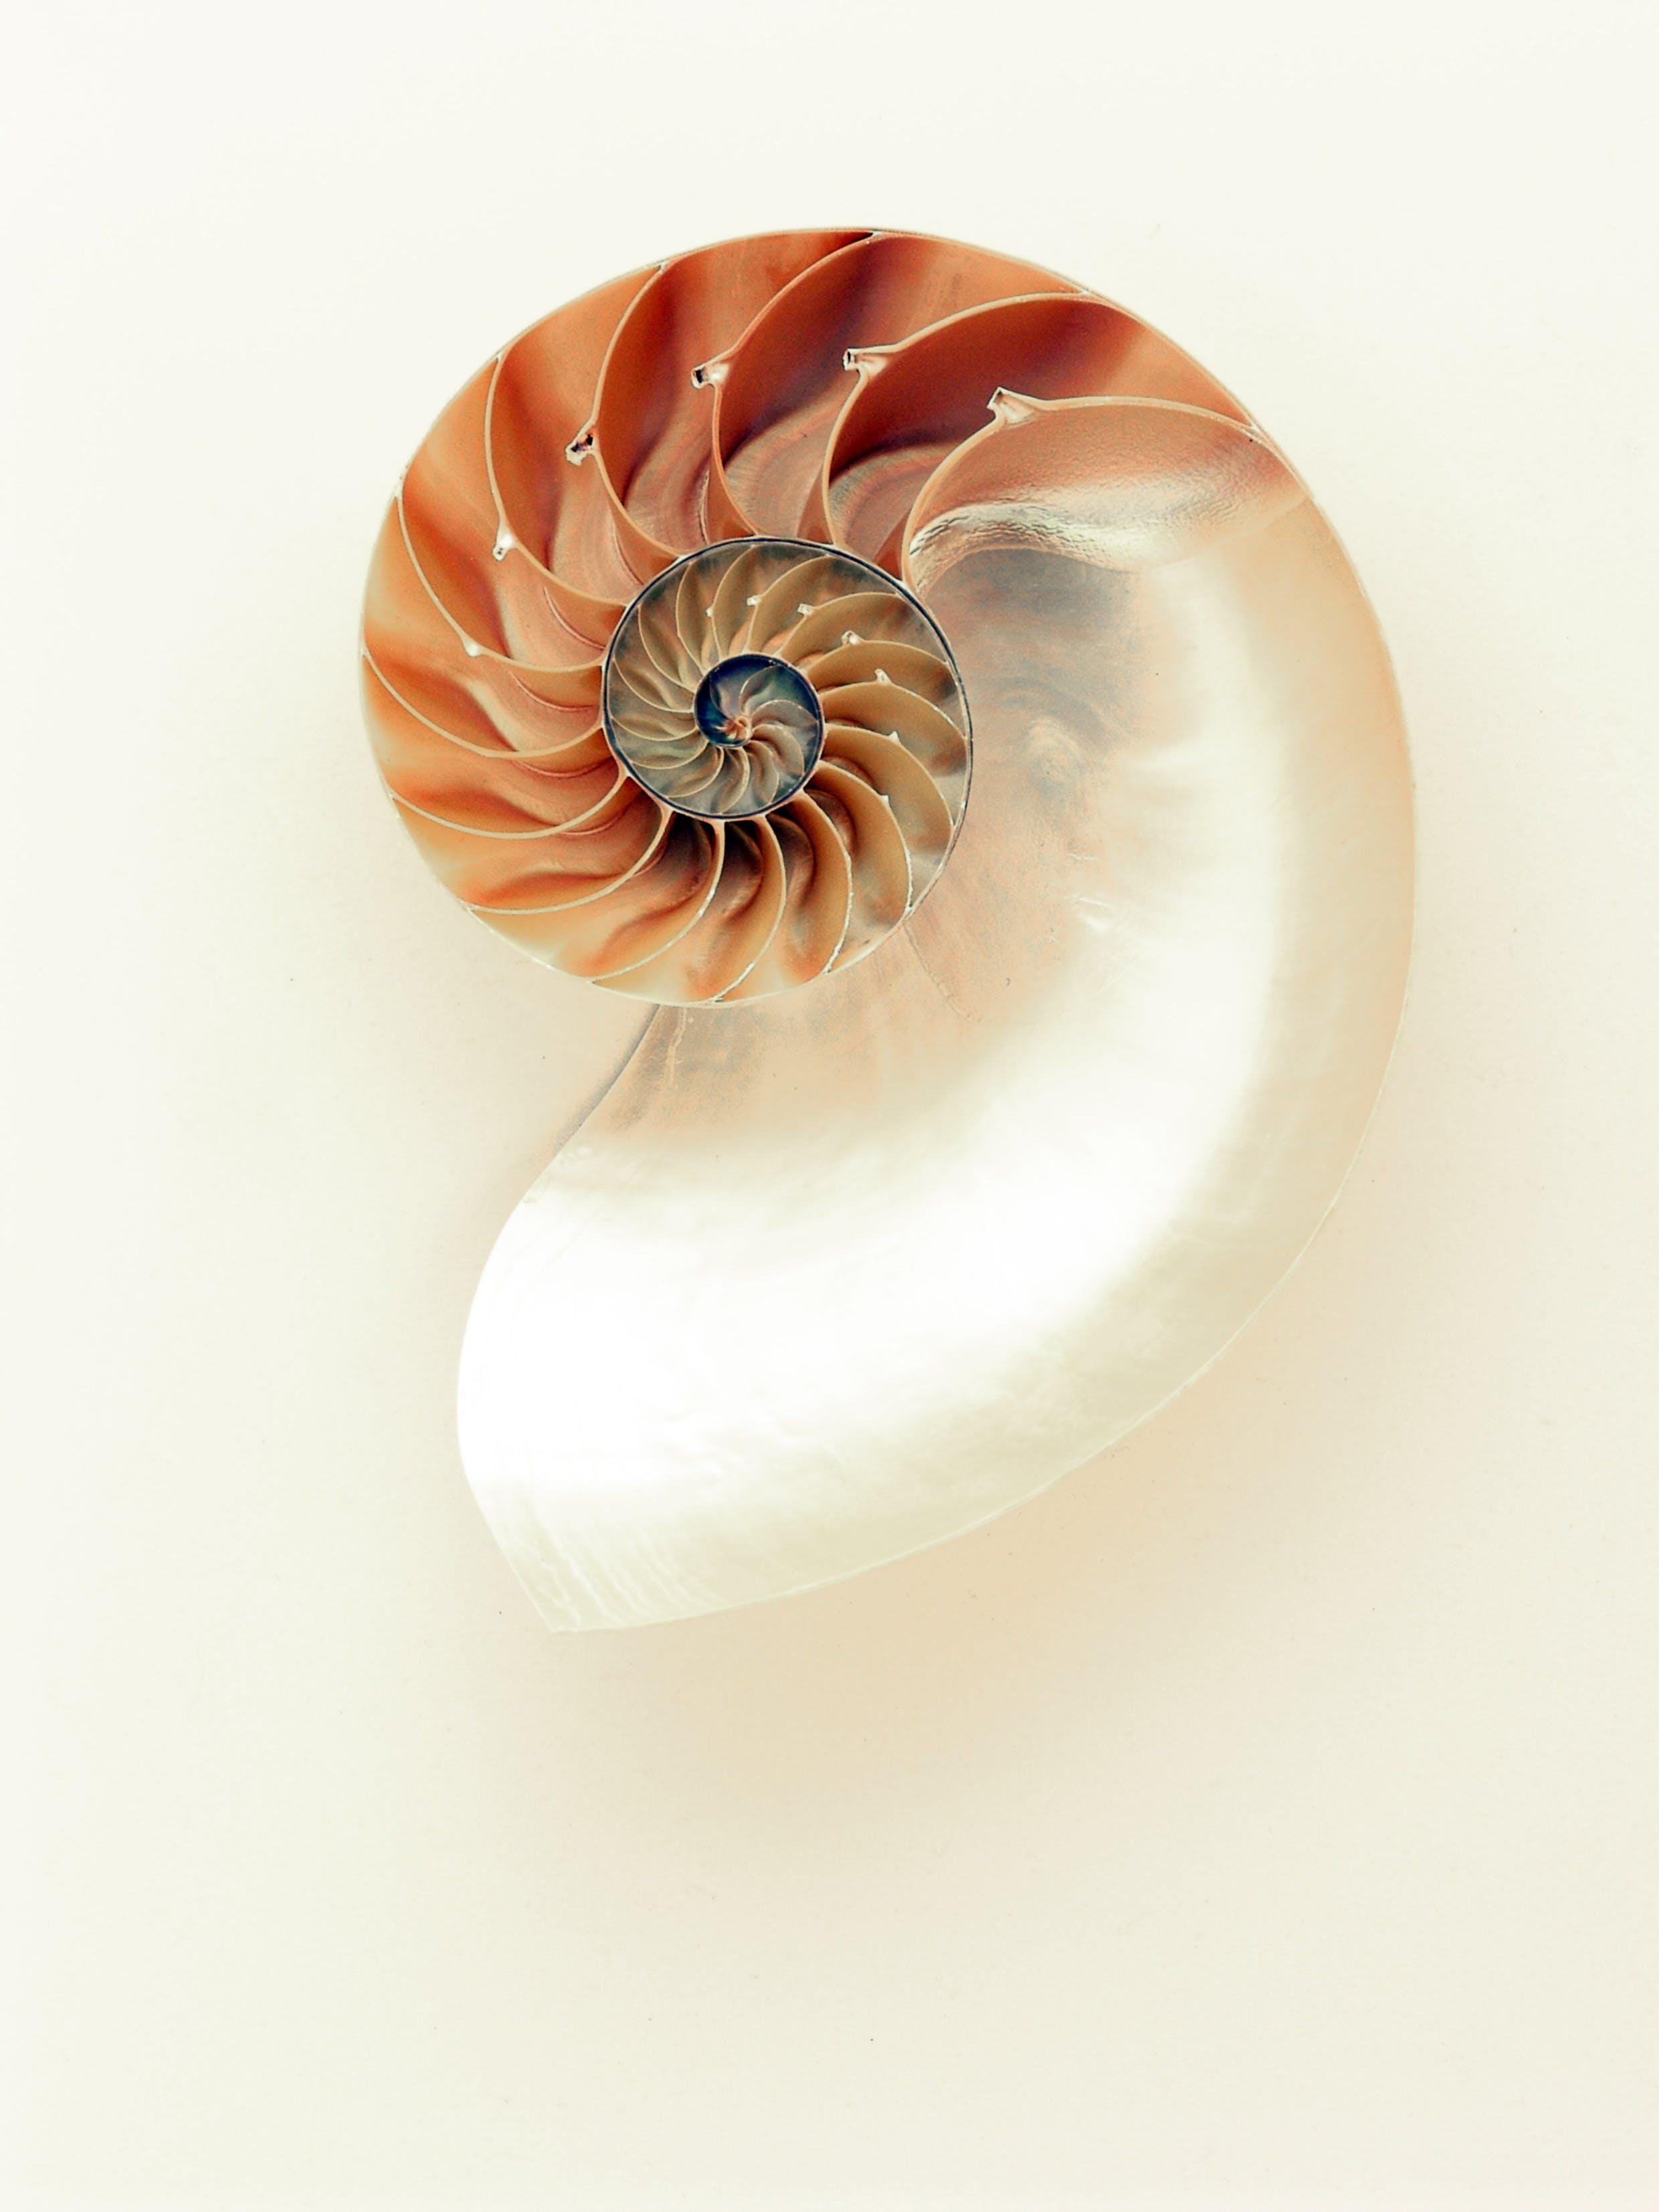 Orange and White Seashell on White Surface